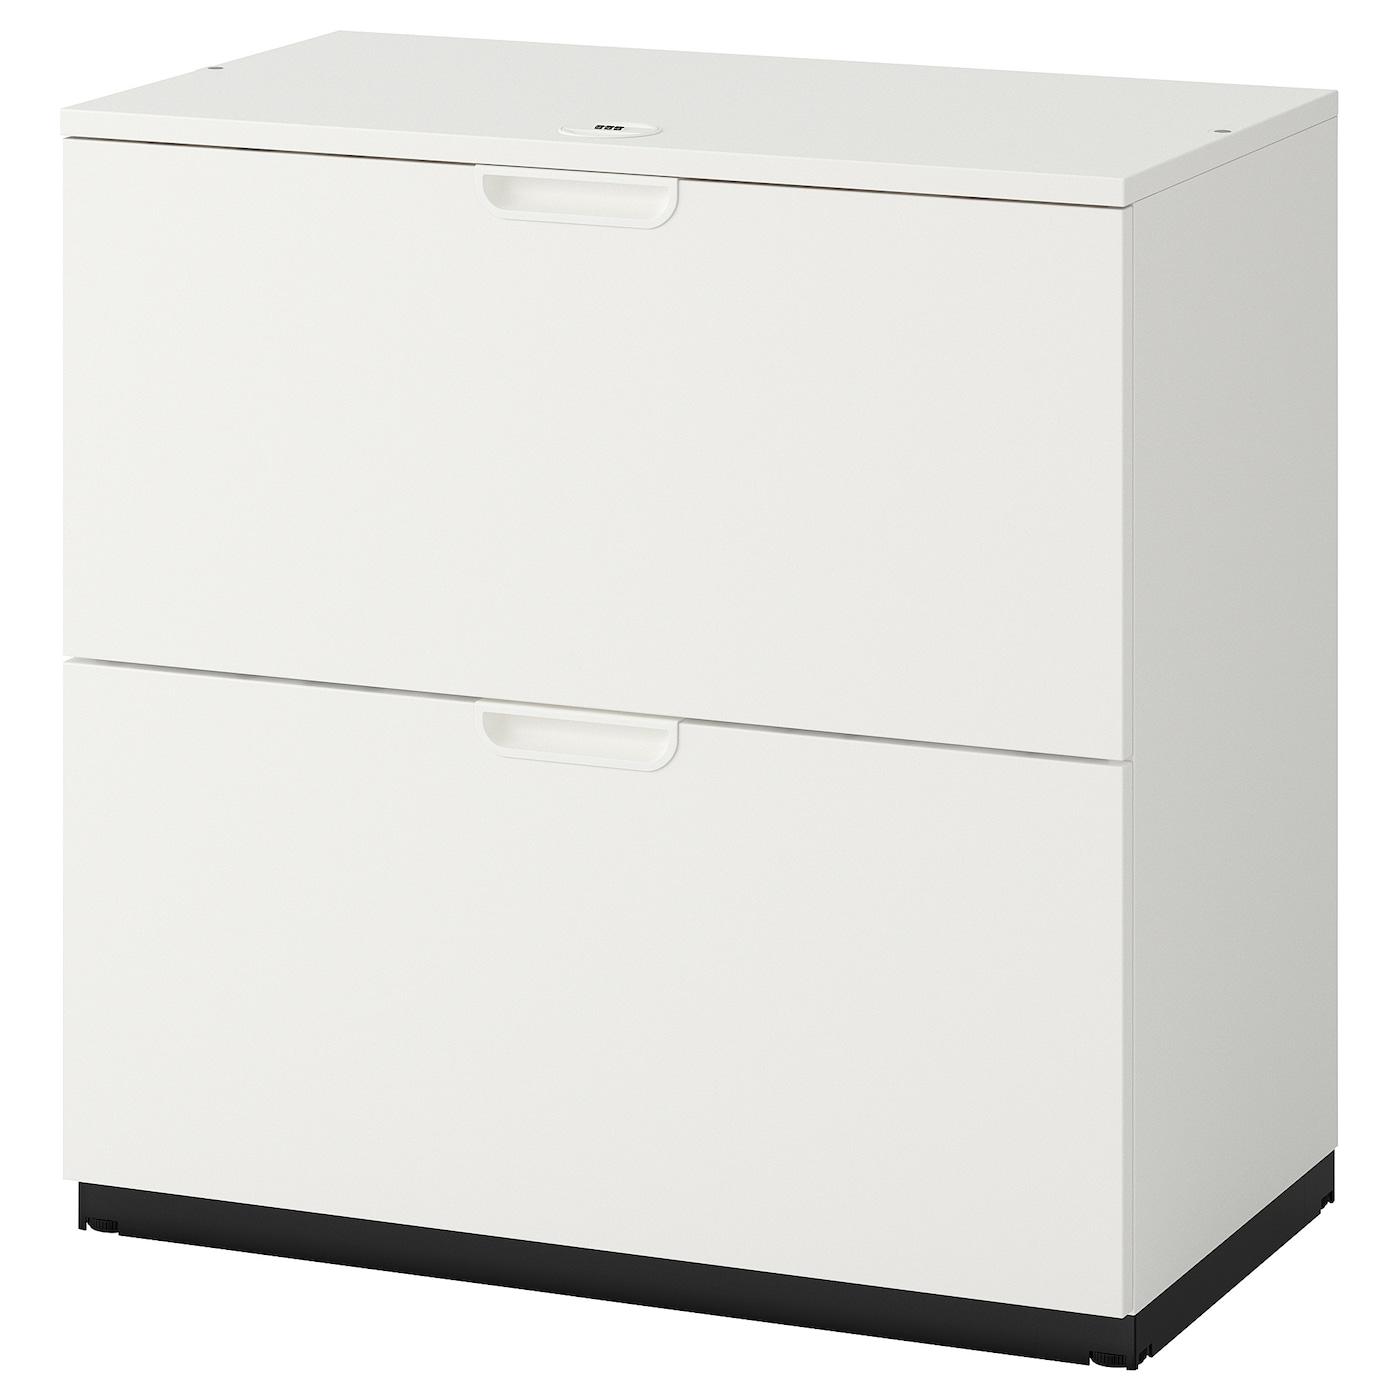 Beech Side Filing Unit2 DrawerLockable Units